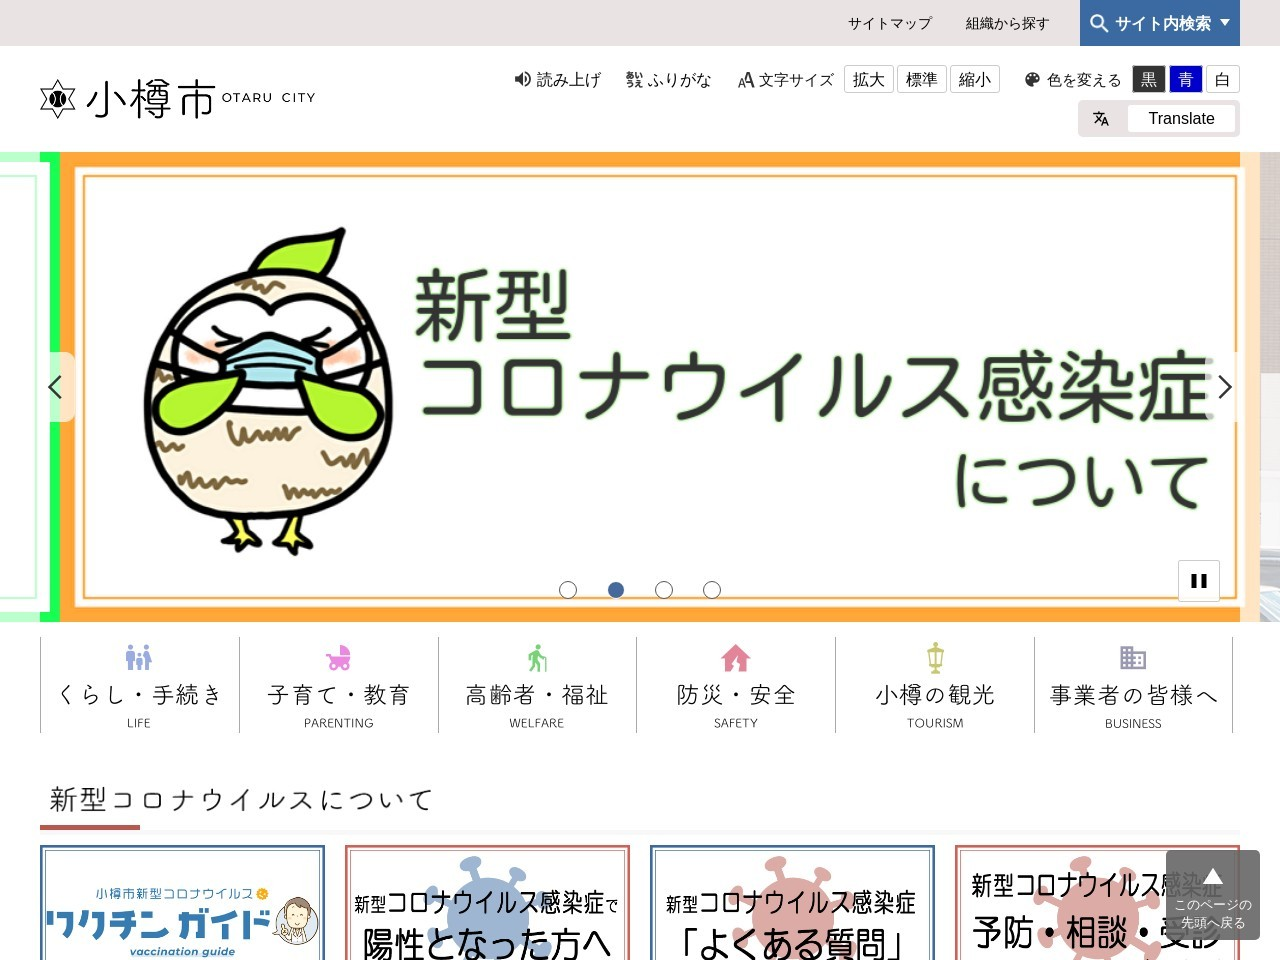 https://www.city.otaru.lg.jp/simin/kyoiku/gakko_kyoiku/kenkyusyo/kensyu.html